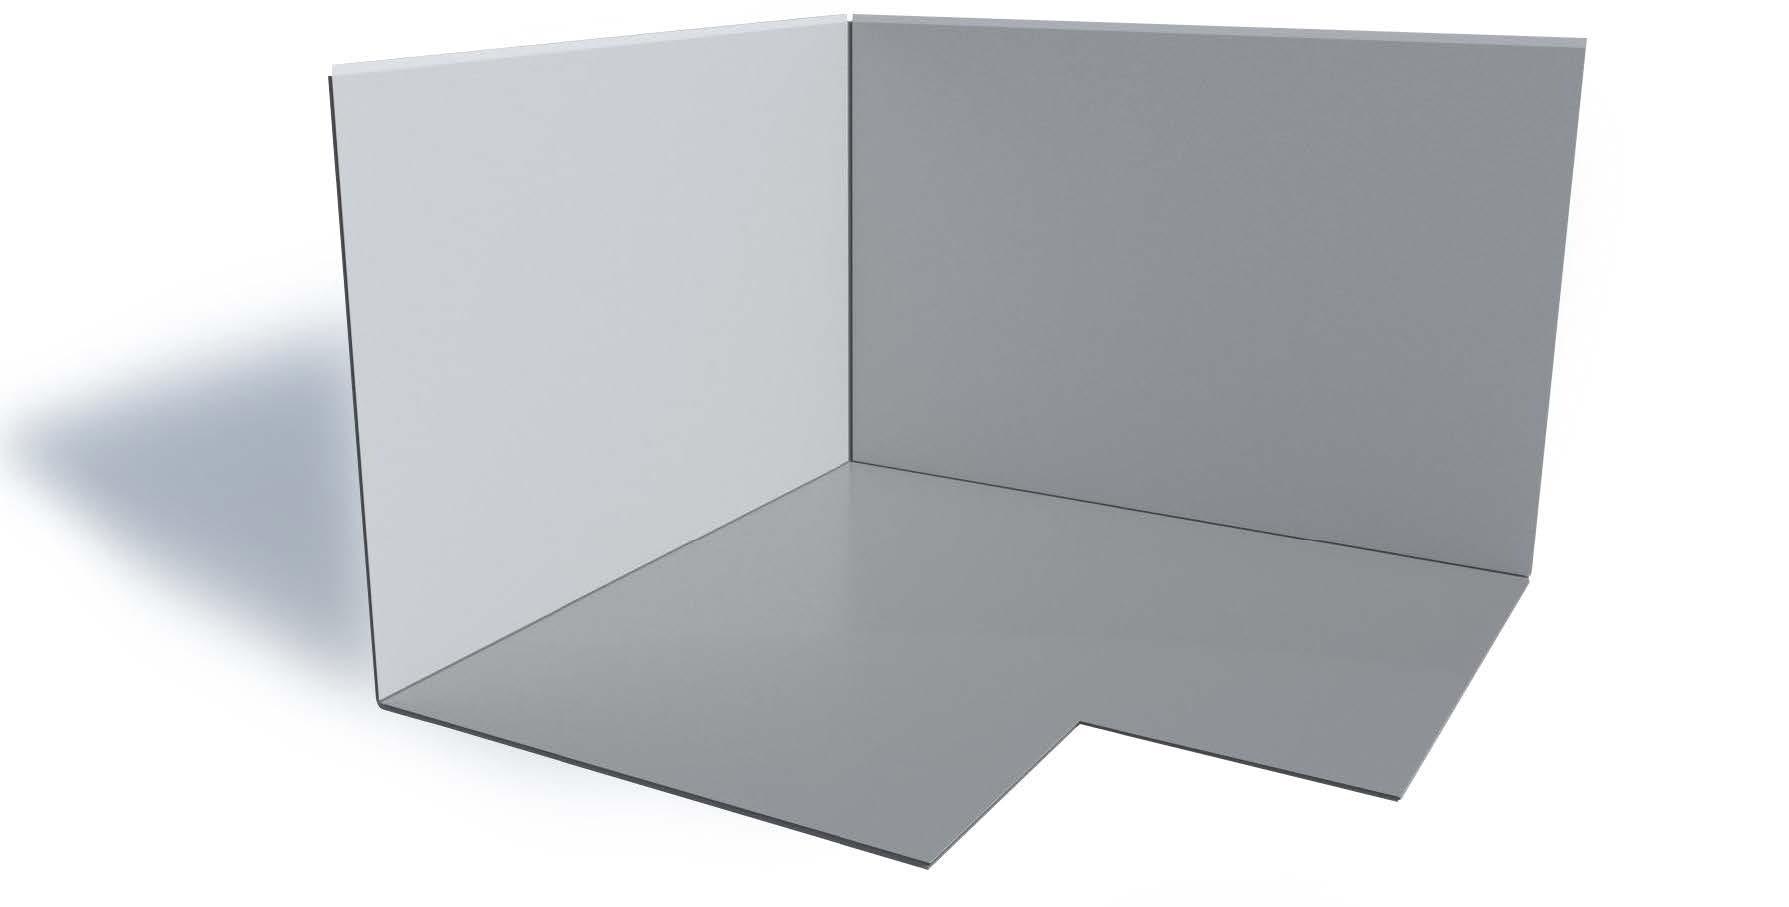 Doubleflex Below Grade Inside Corner